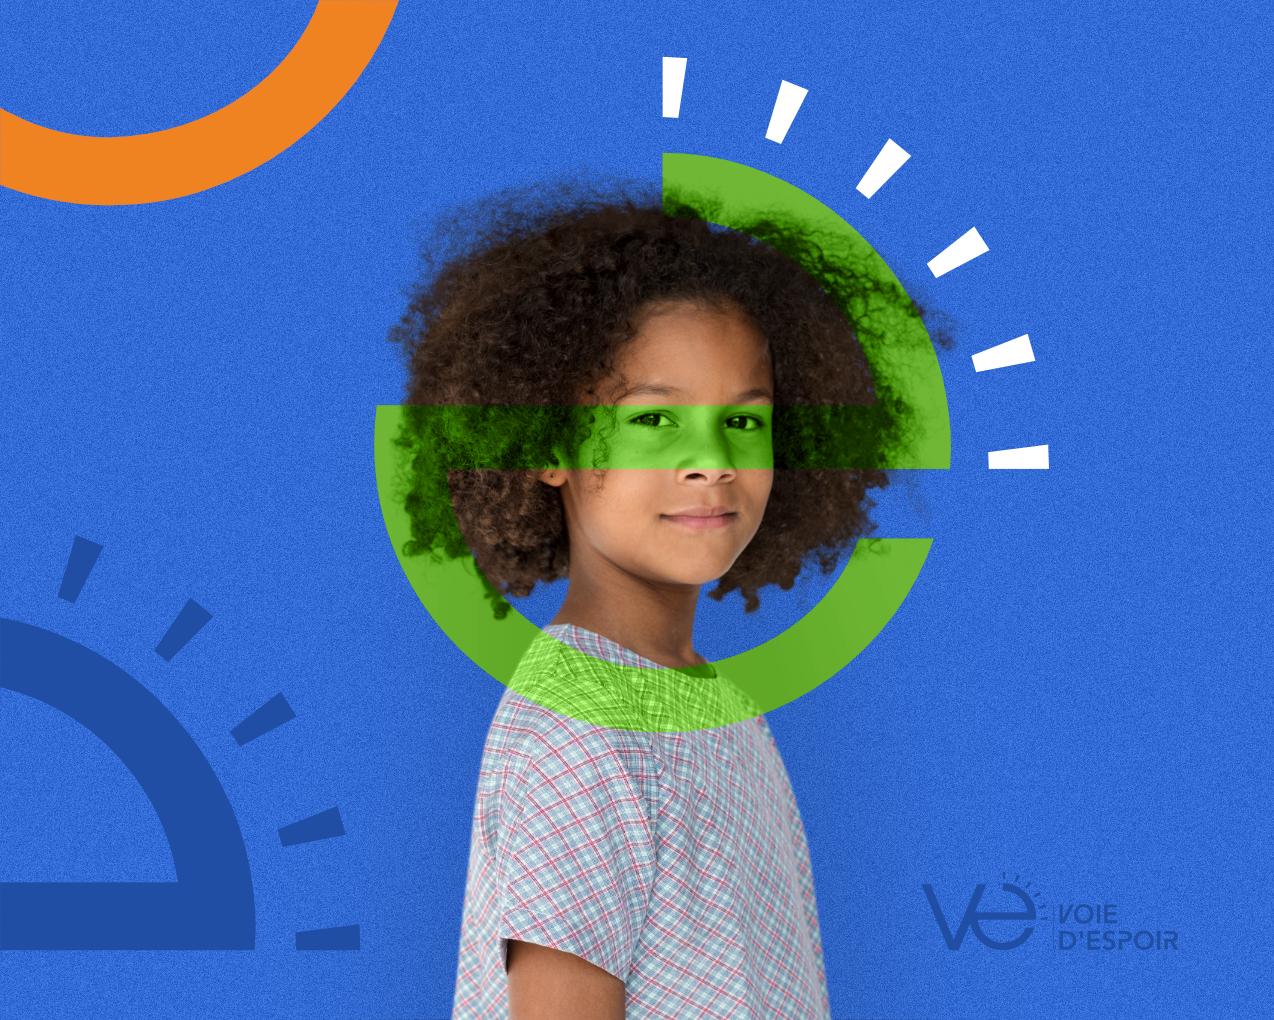 HaitiBrand Creates a New Brand for the Nonprofit Voie D'espoir